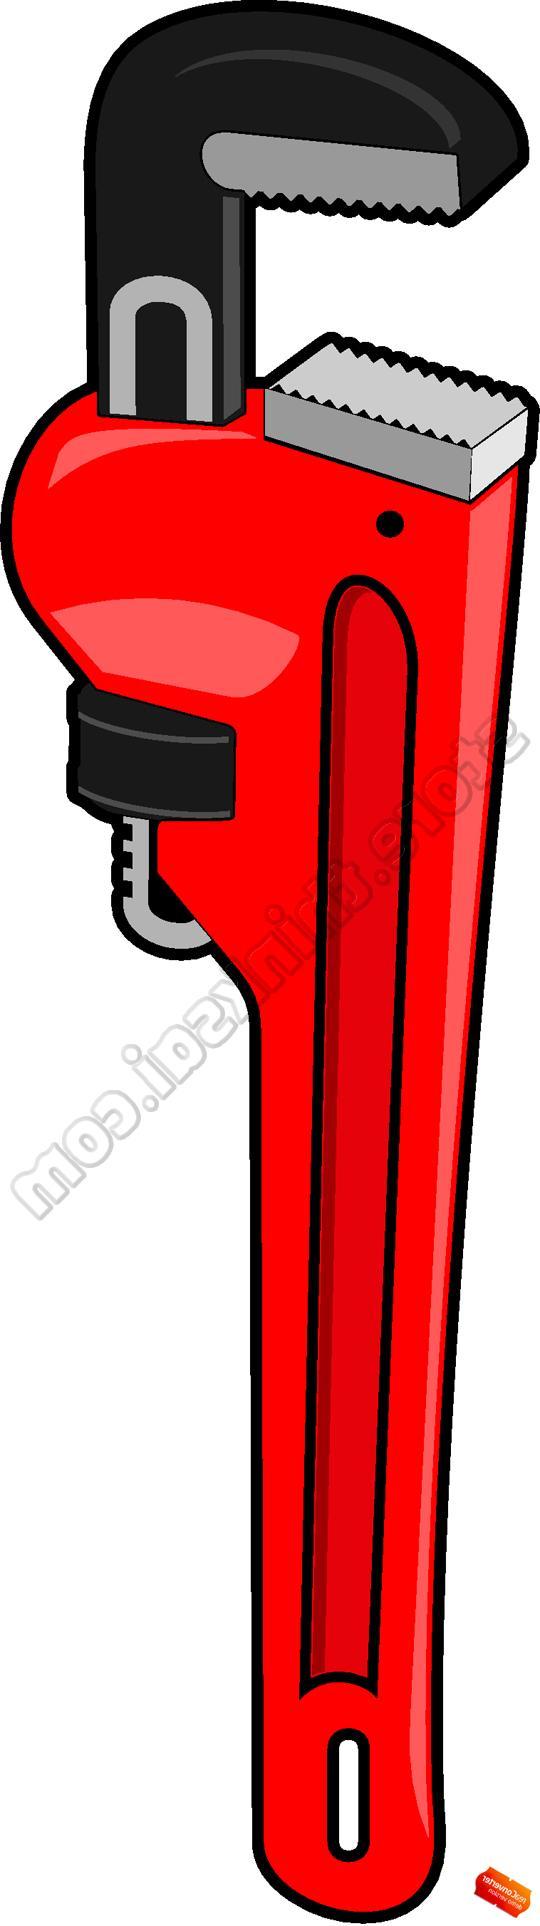 Best HD Plumber Tools Clip Art Cdr » Free Vector Art, Images.